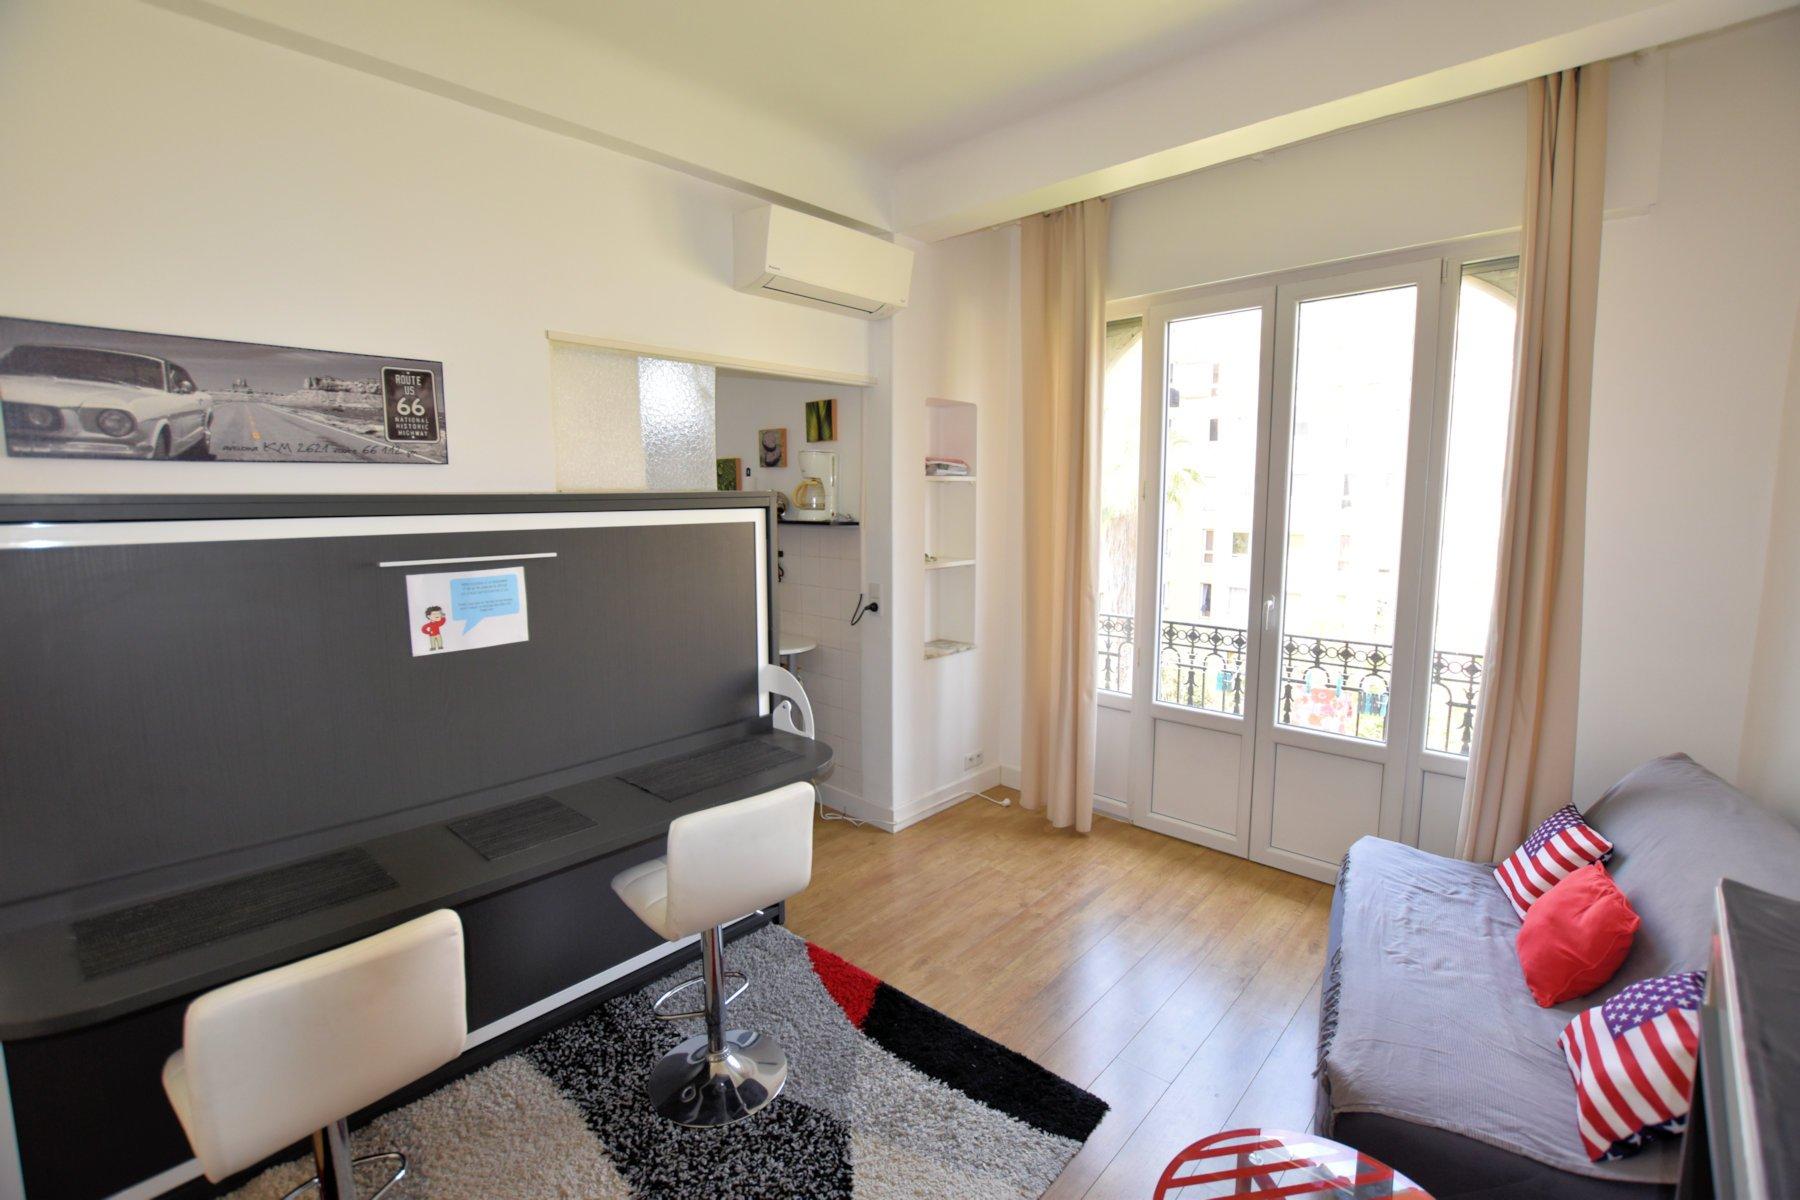 Location étudiante Studio meublé Nice Thiers - Jean Médecin